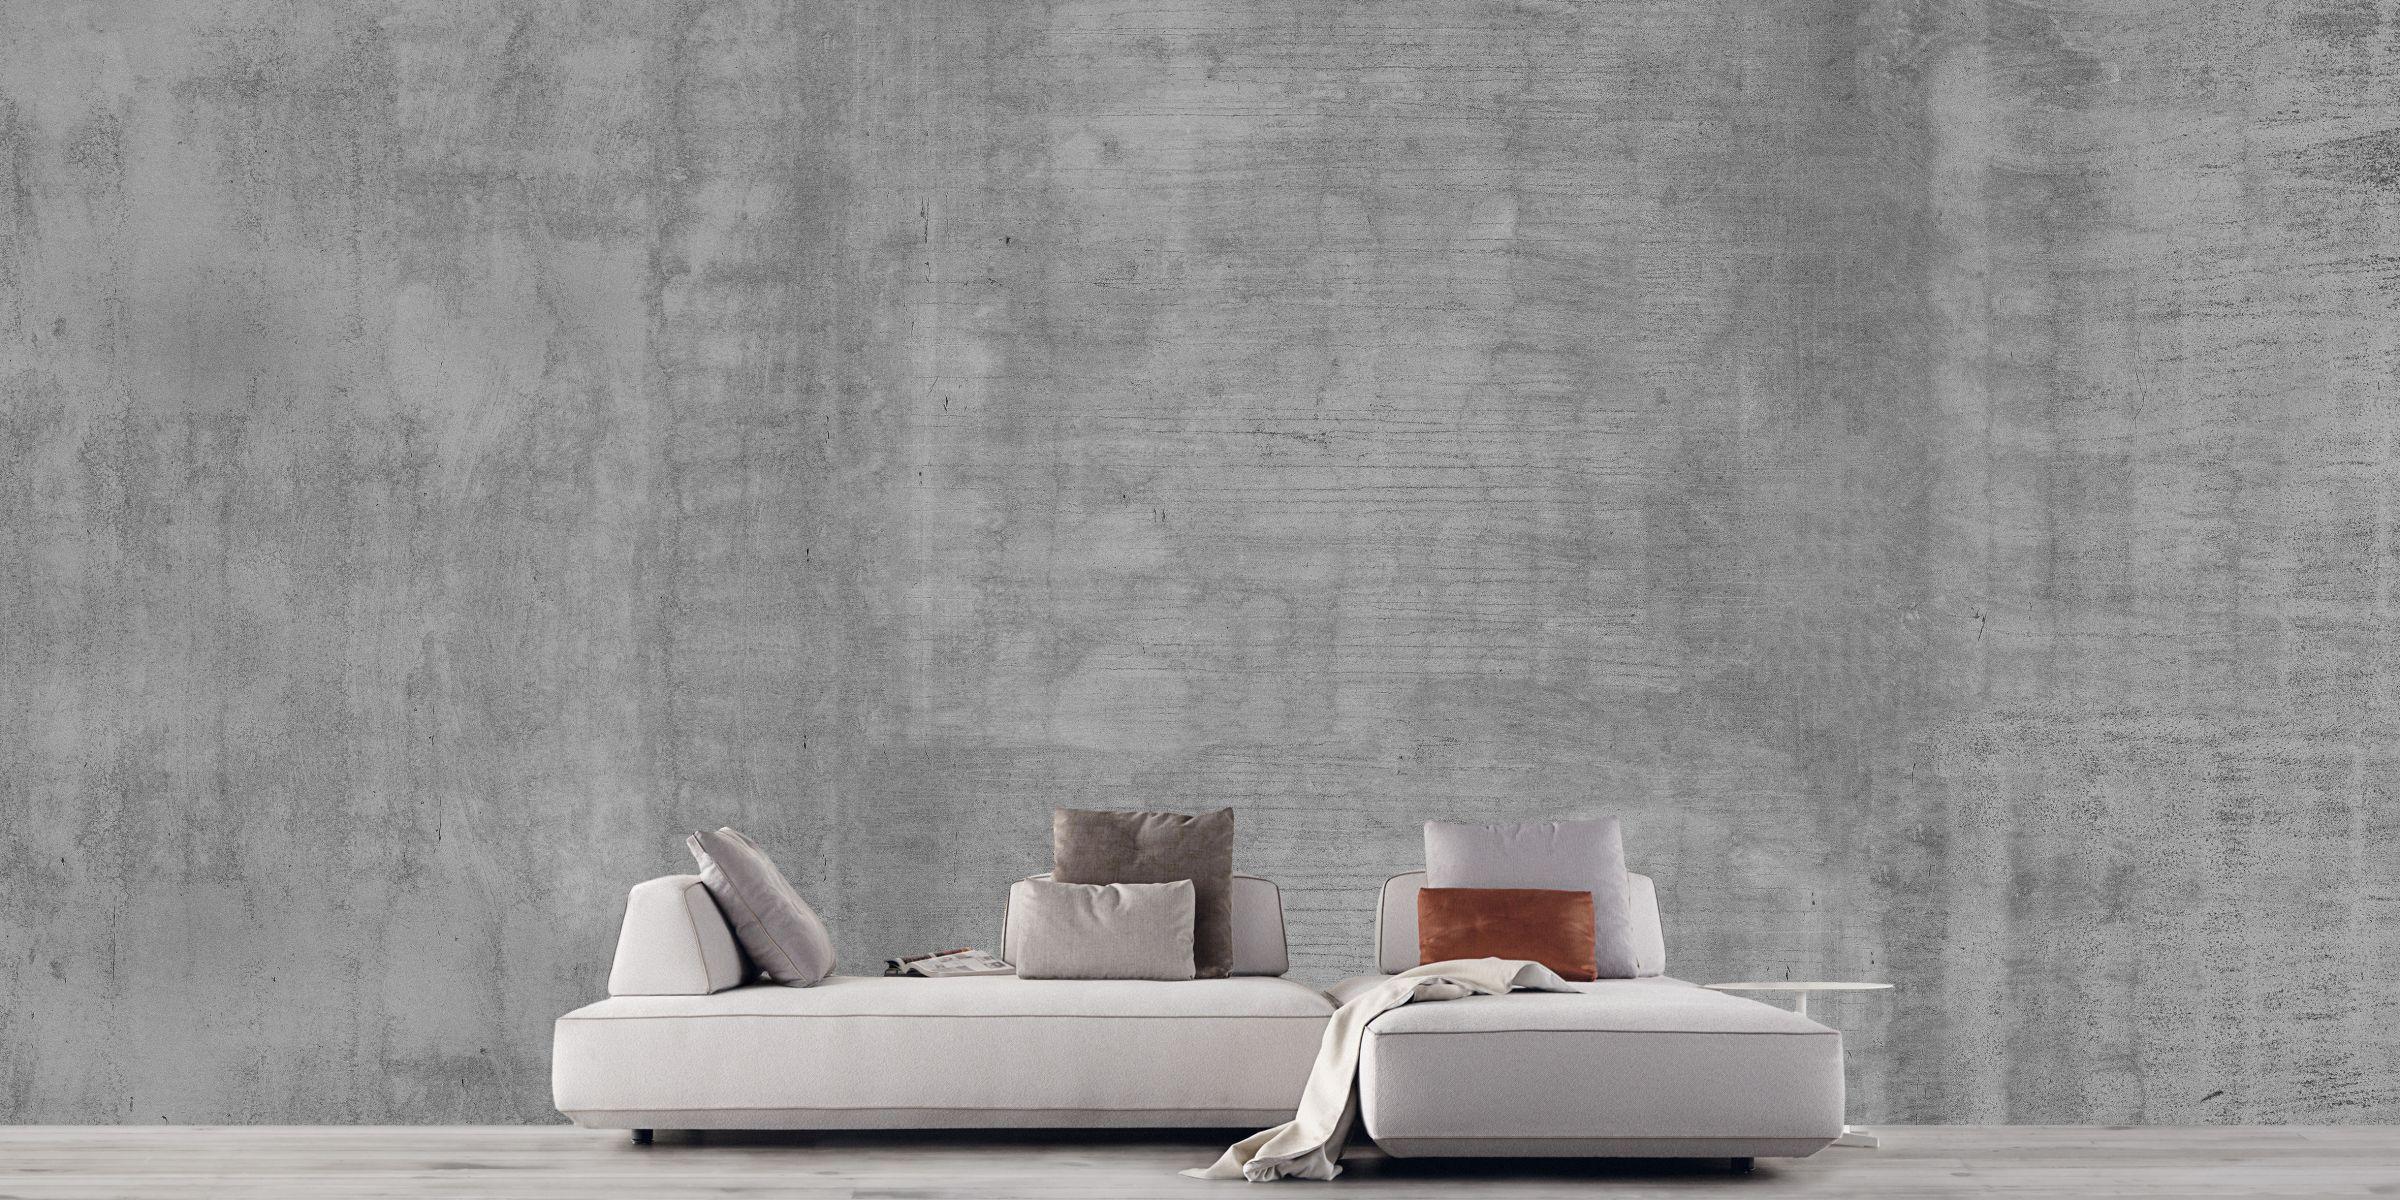 CW37_600x300_sofa.jpg